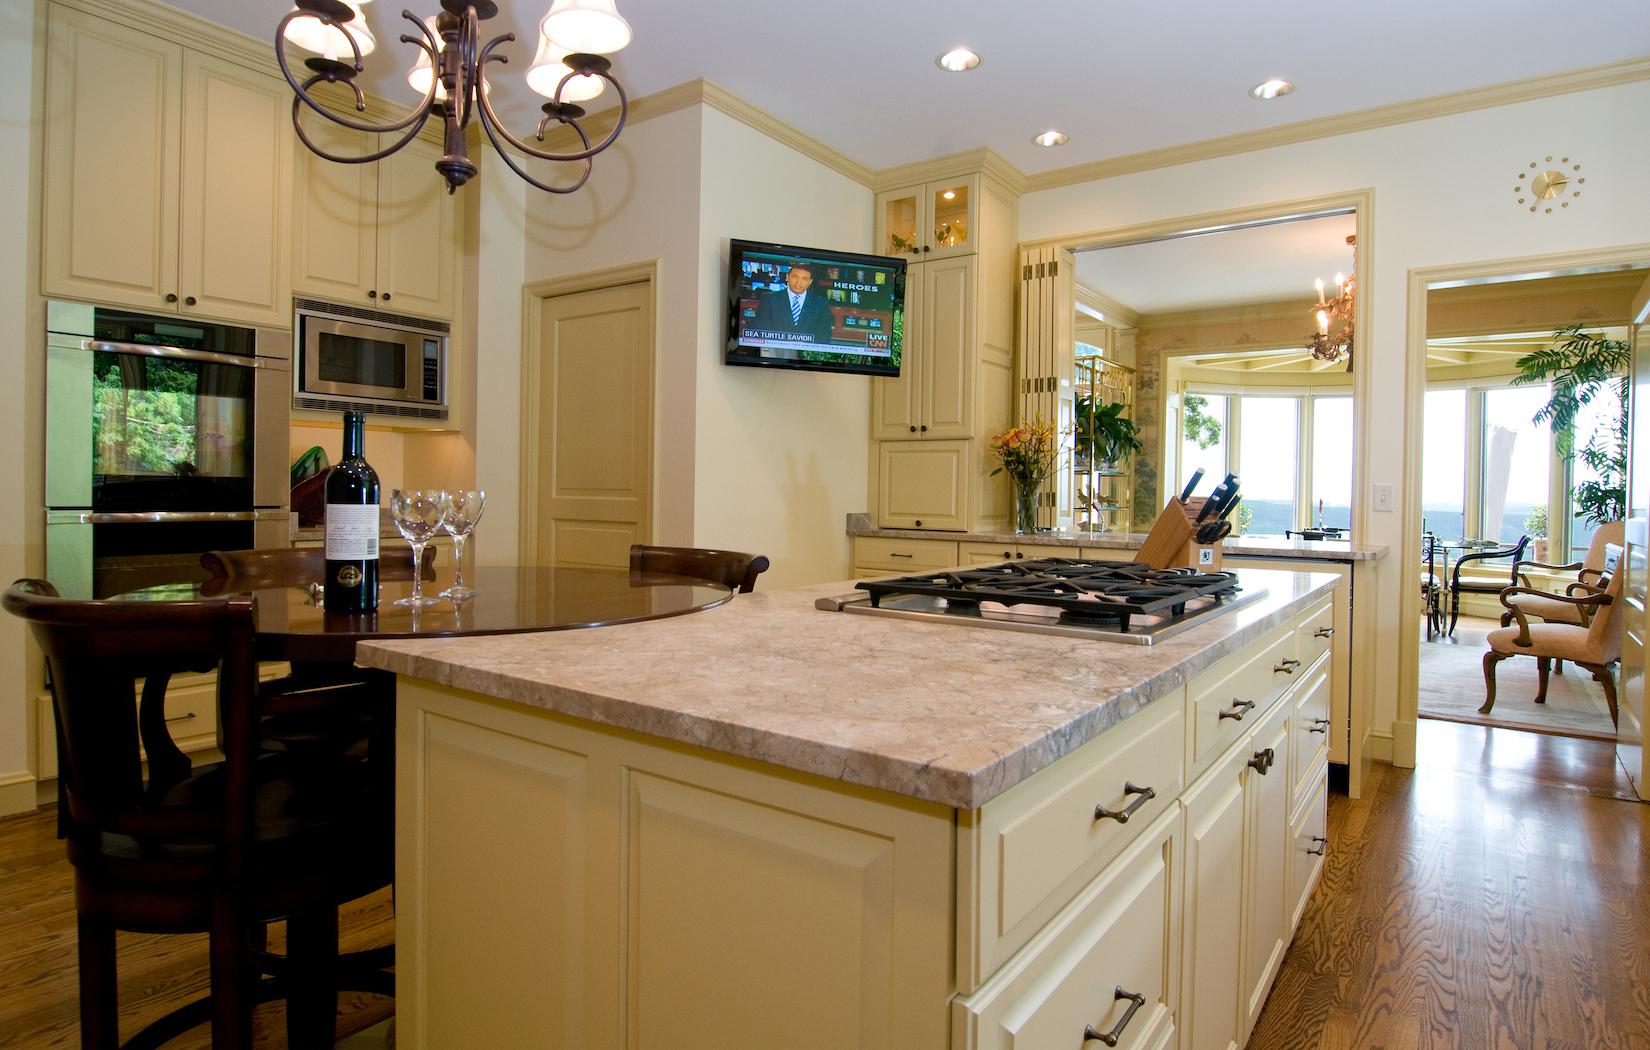 chattanooga kitchen remodel.jpg